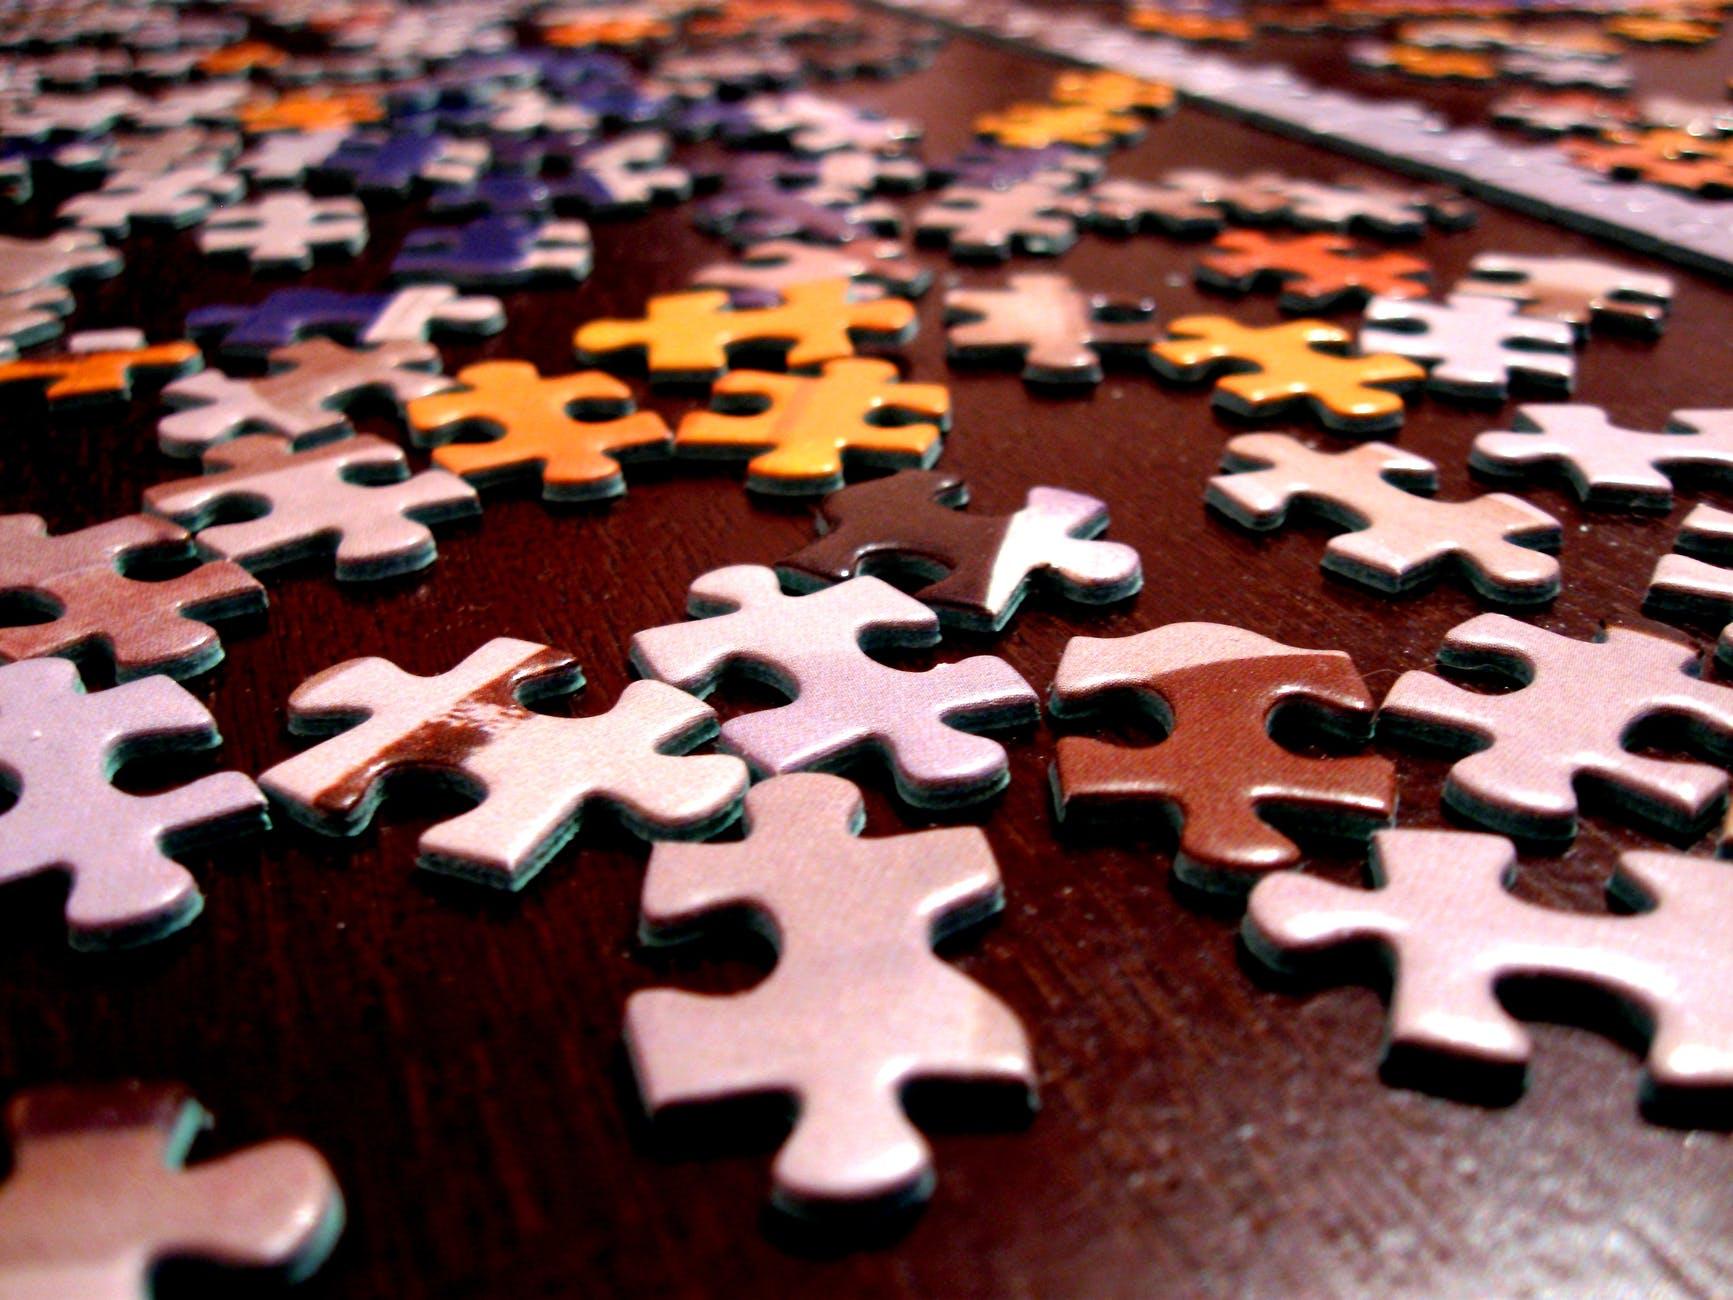 assemble challenge combine creativity